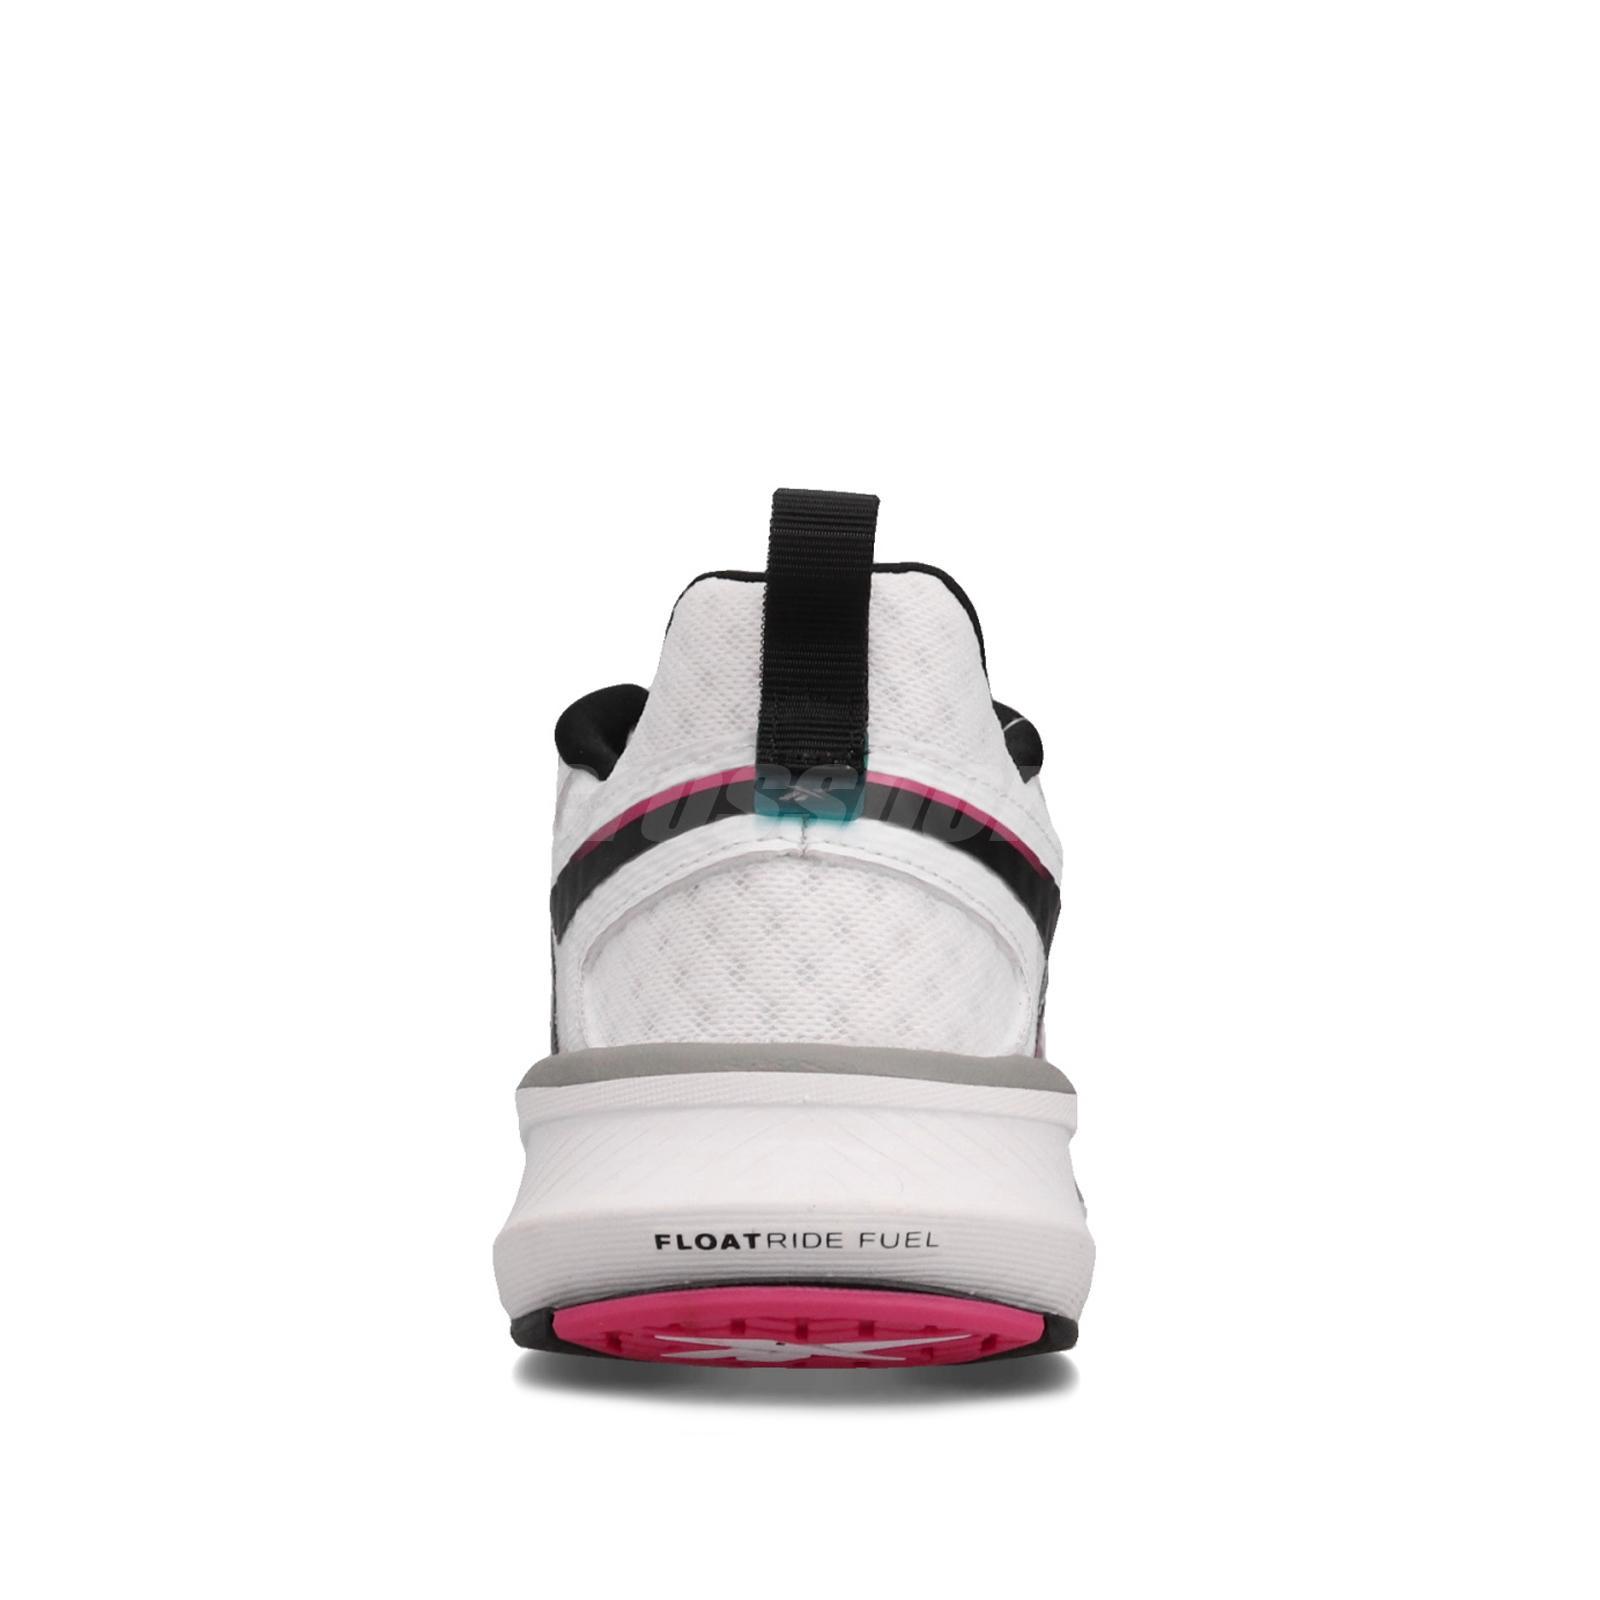 Reebok Rbk Fusium Run 20 White Black Pink Womens Cushion Running Shoes Eh0367 Ebay